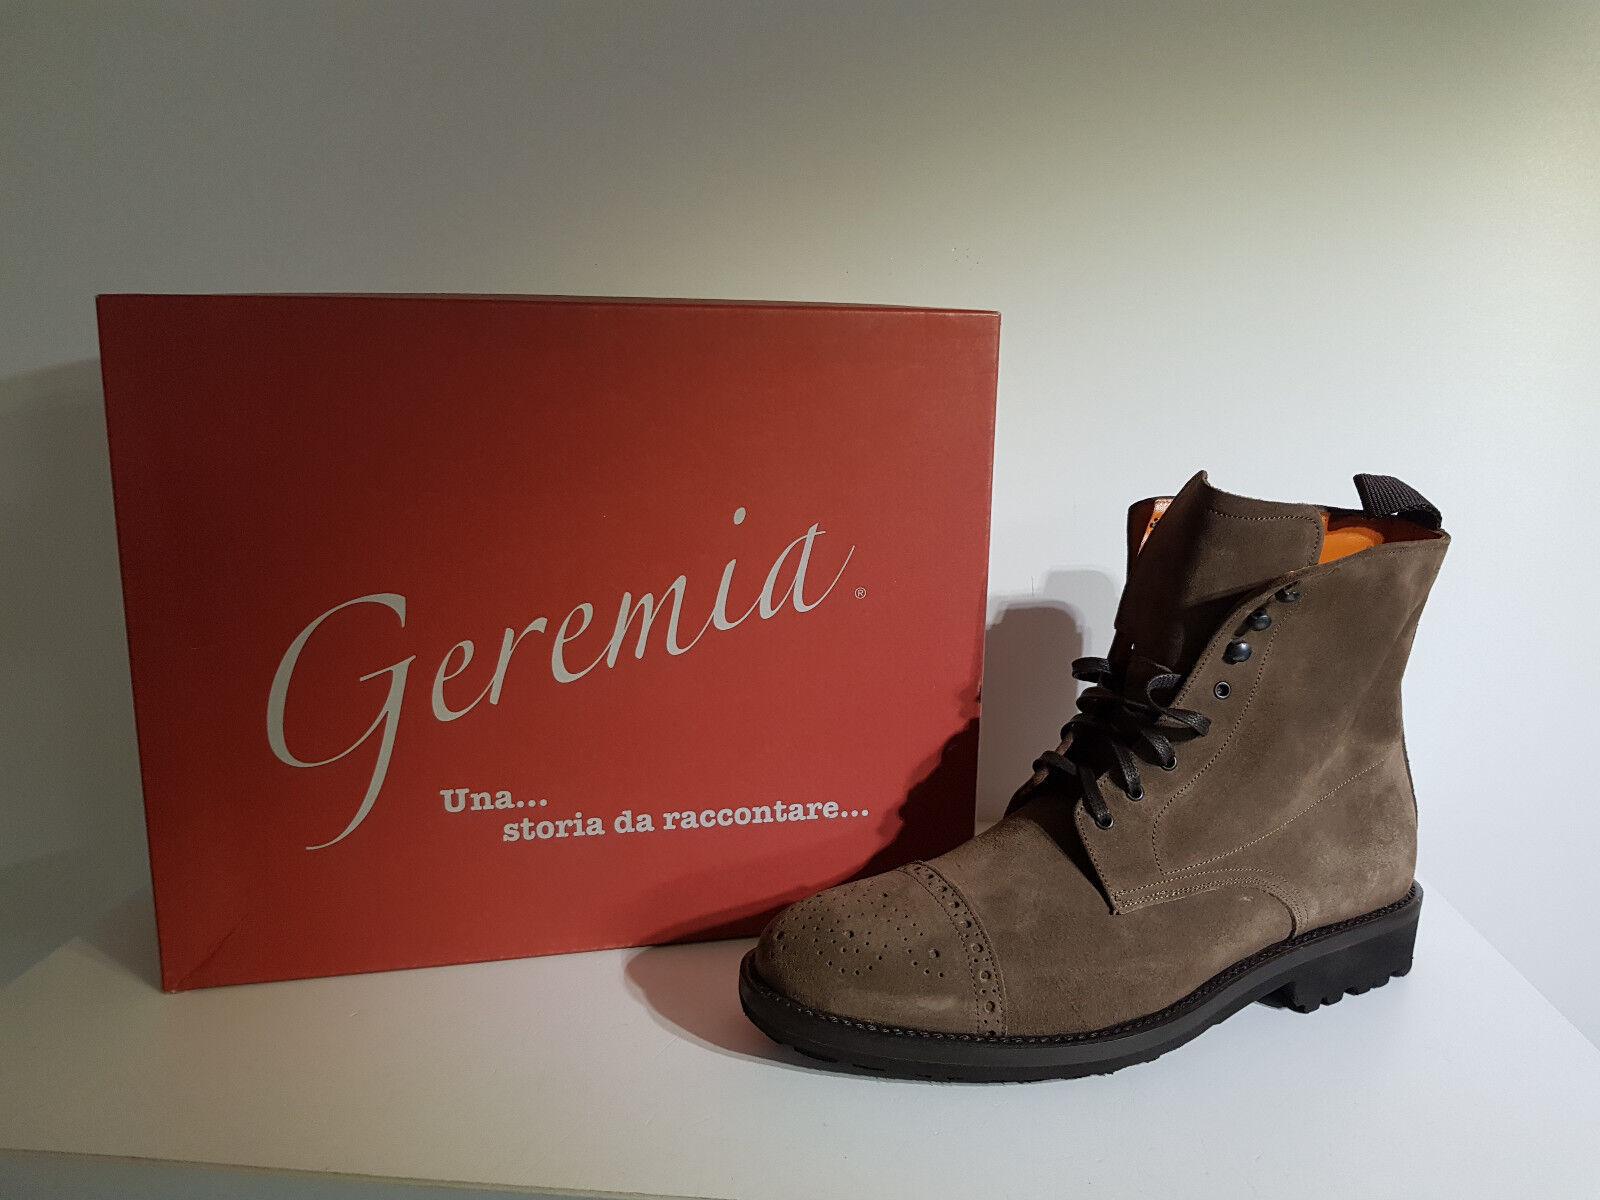 Herren Schuhe Geremia Rabatt. - 60%Artikel 245-4998 Velour Velour Velour taupe Braun. 22d6dd